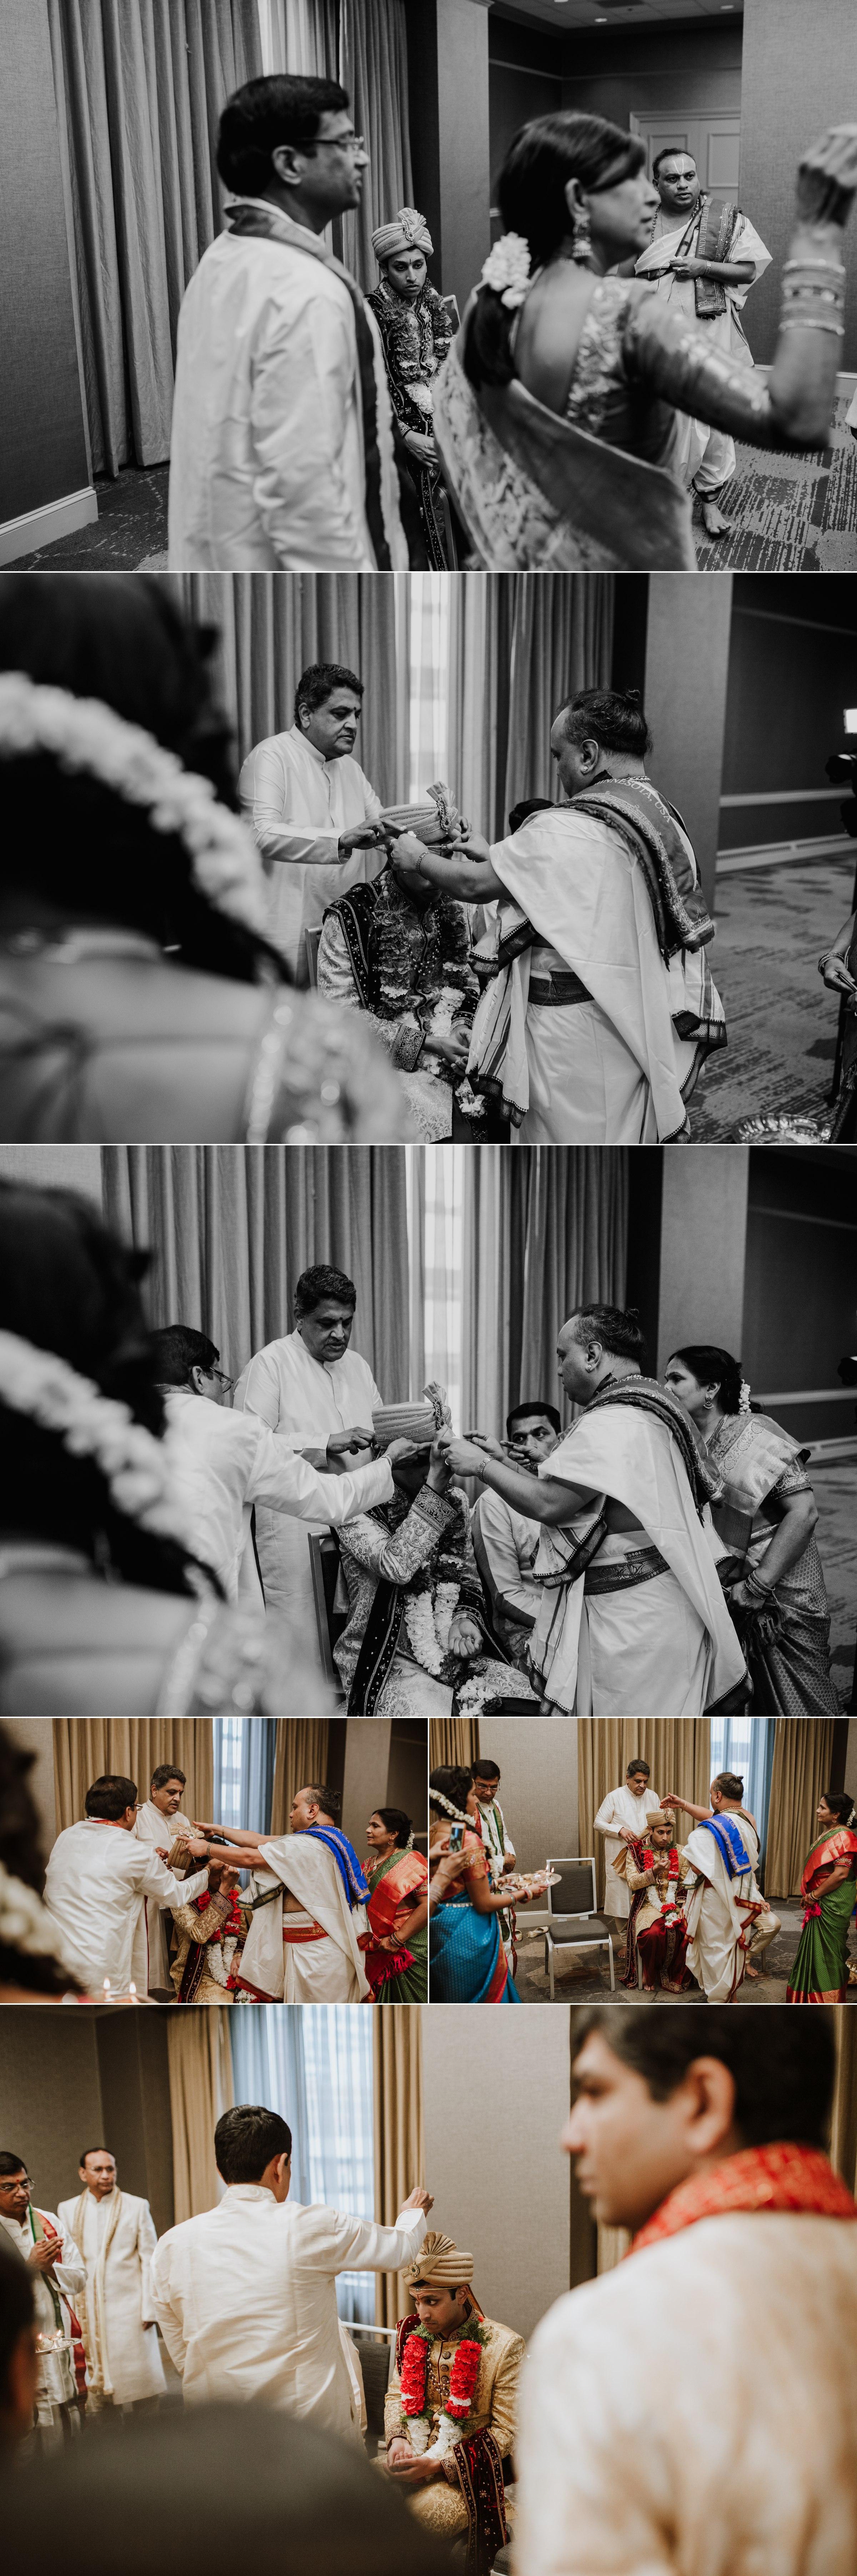 indian wedding minneapolis minnesota texas austin wedding elopement destination intimate best photographer_0012.jpg